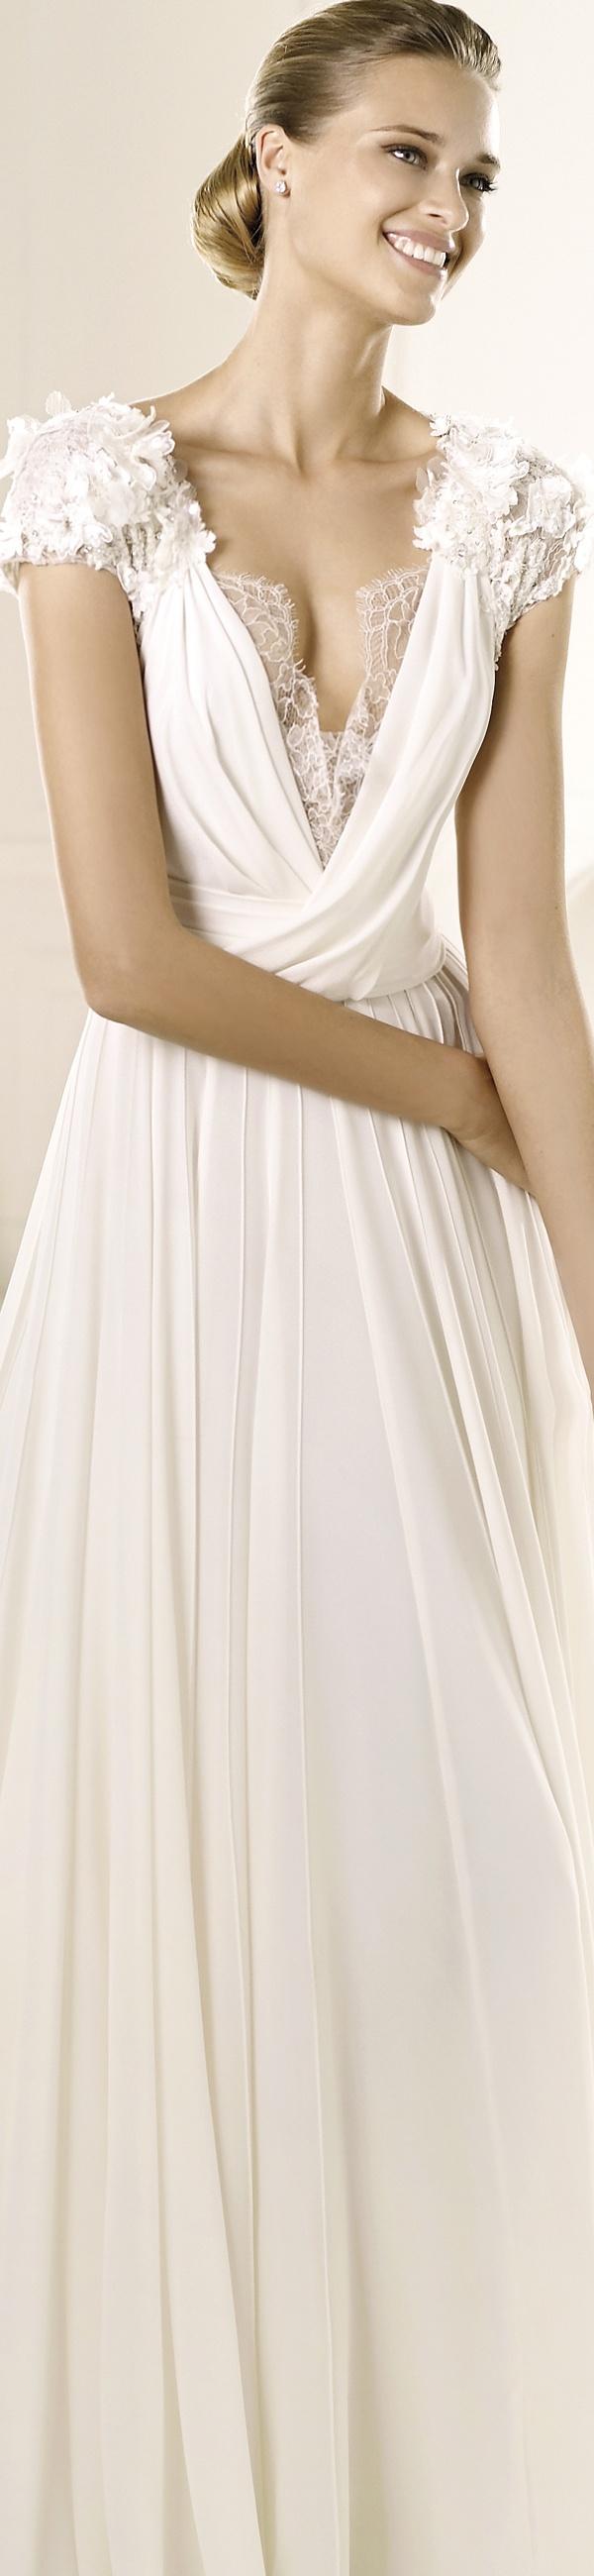 "Vestido de #novia de Elie Saab en @Pronovias / Elie by Elie Saab #wedding dress ""Louisse"", 2013 Collection"